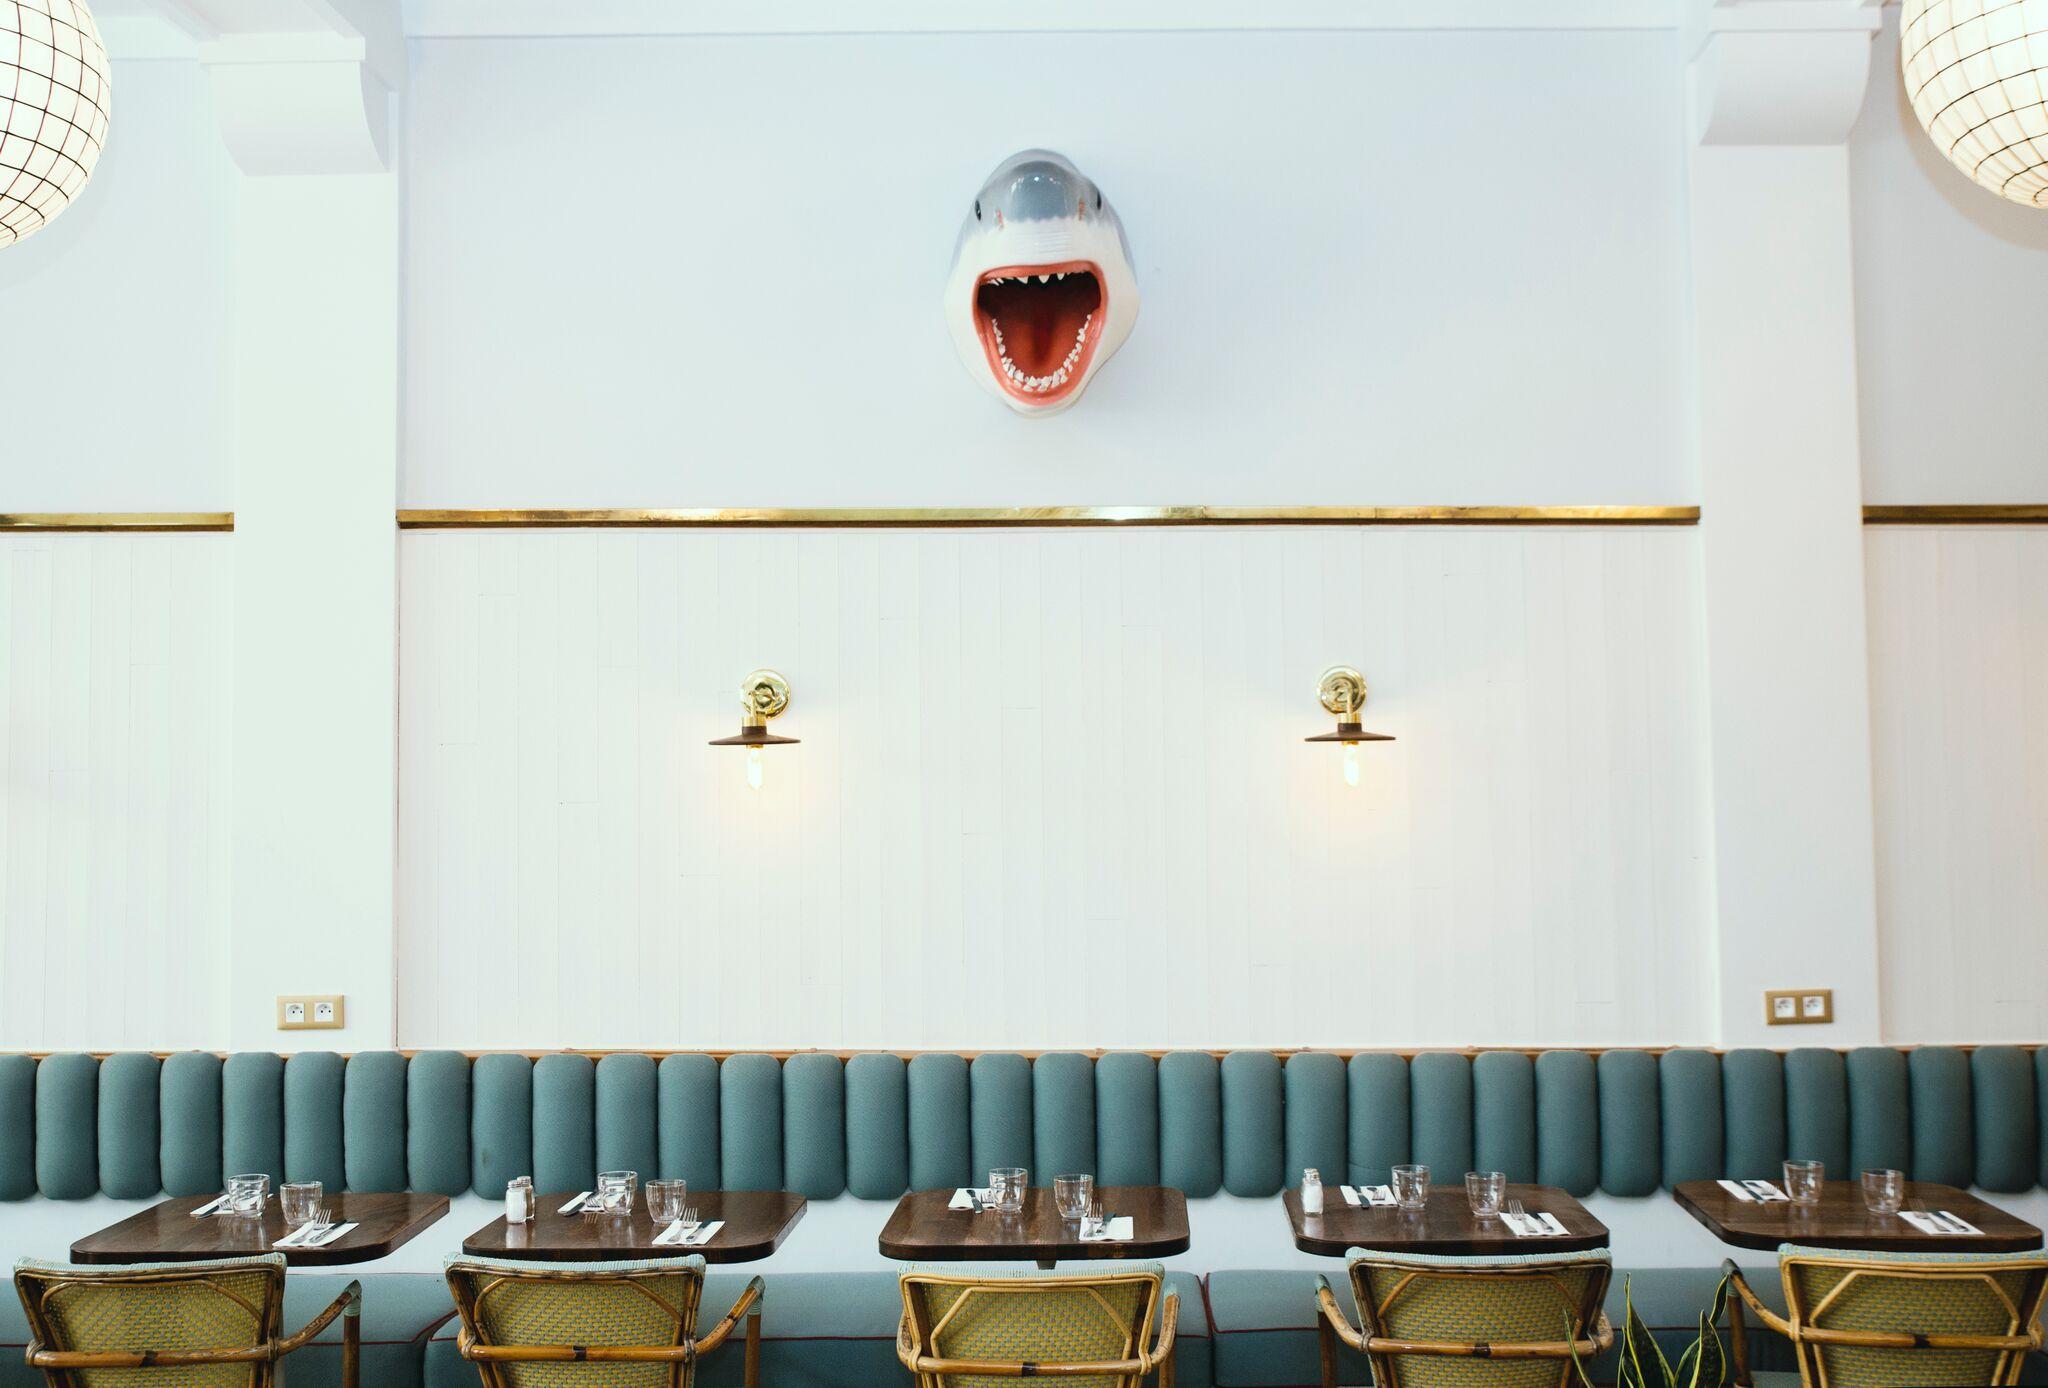 Le-Yacht-Club-salle-©Quentin-O'bear-Jumeaucourt-2_preview